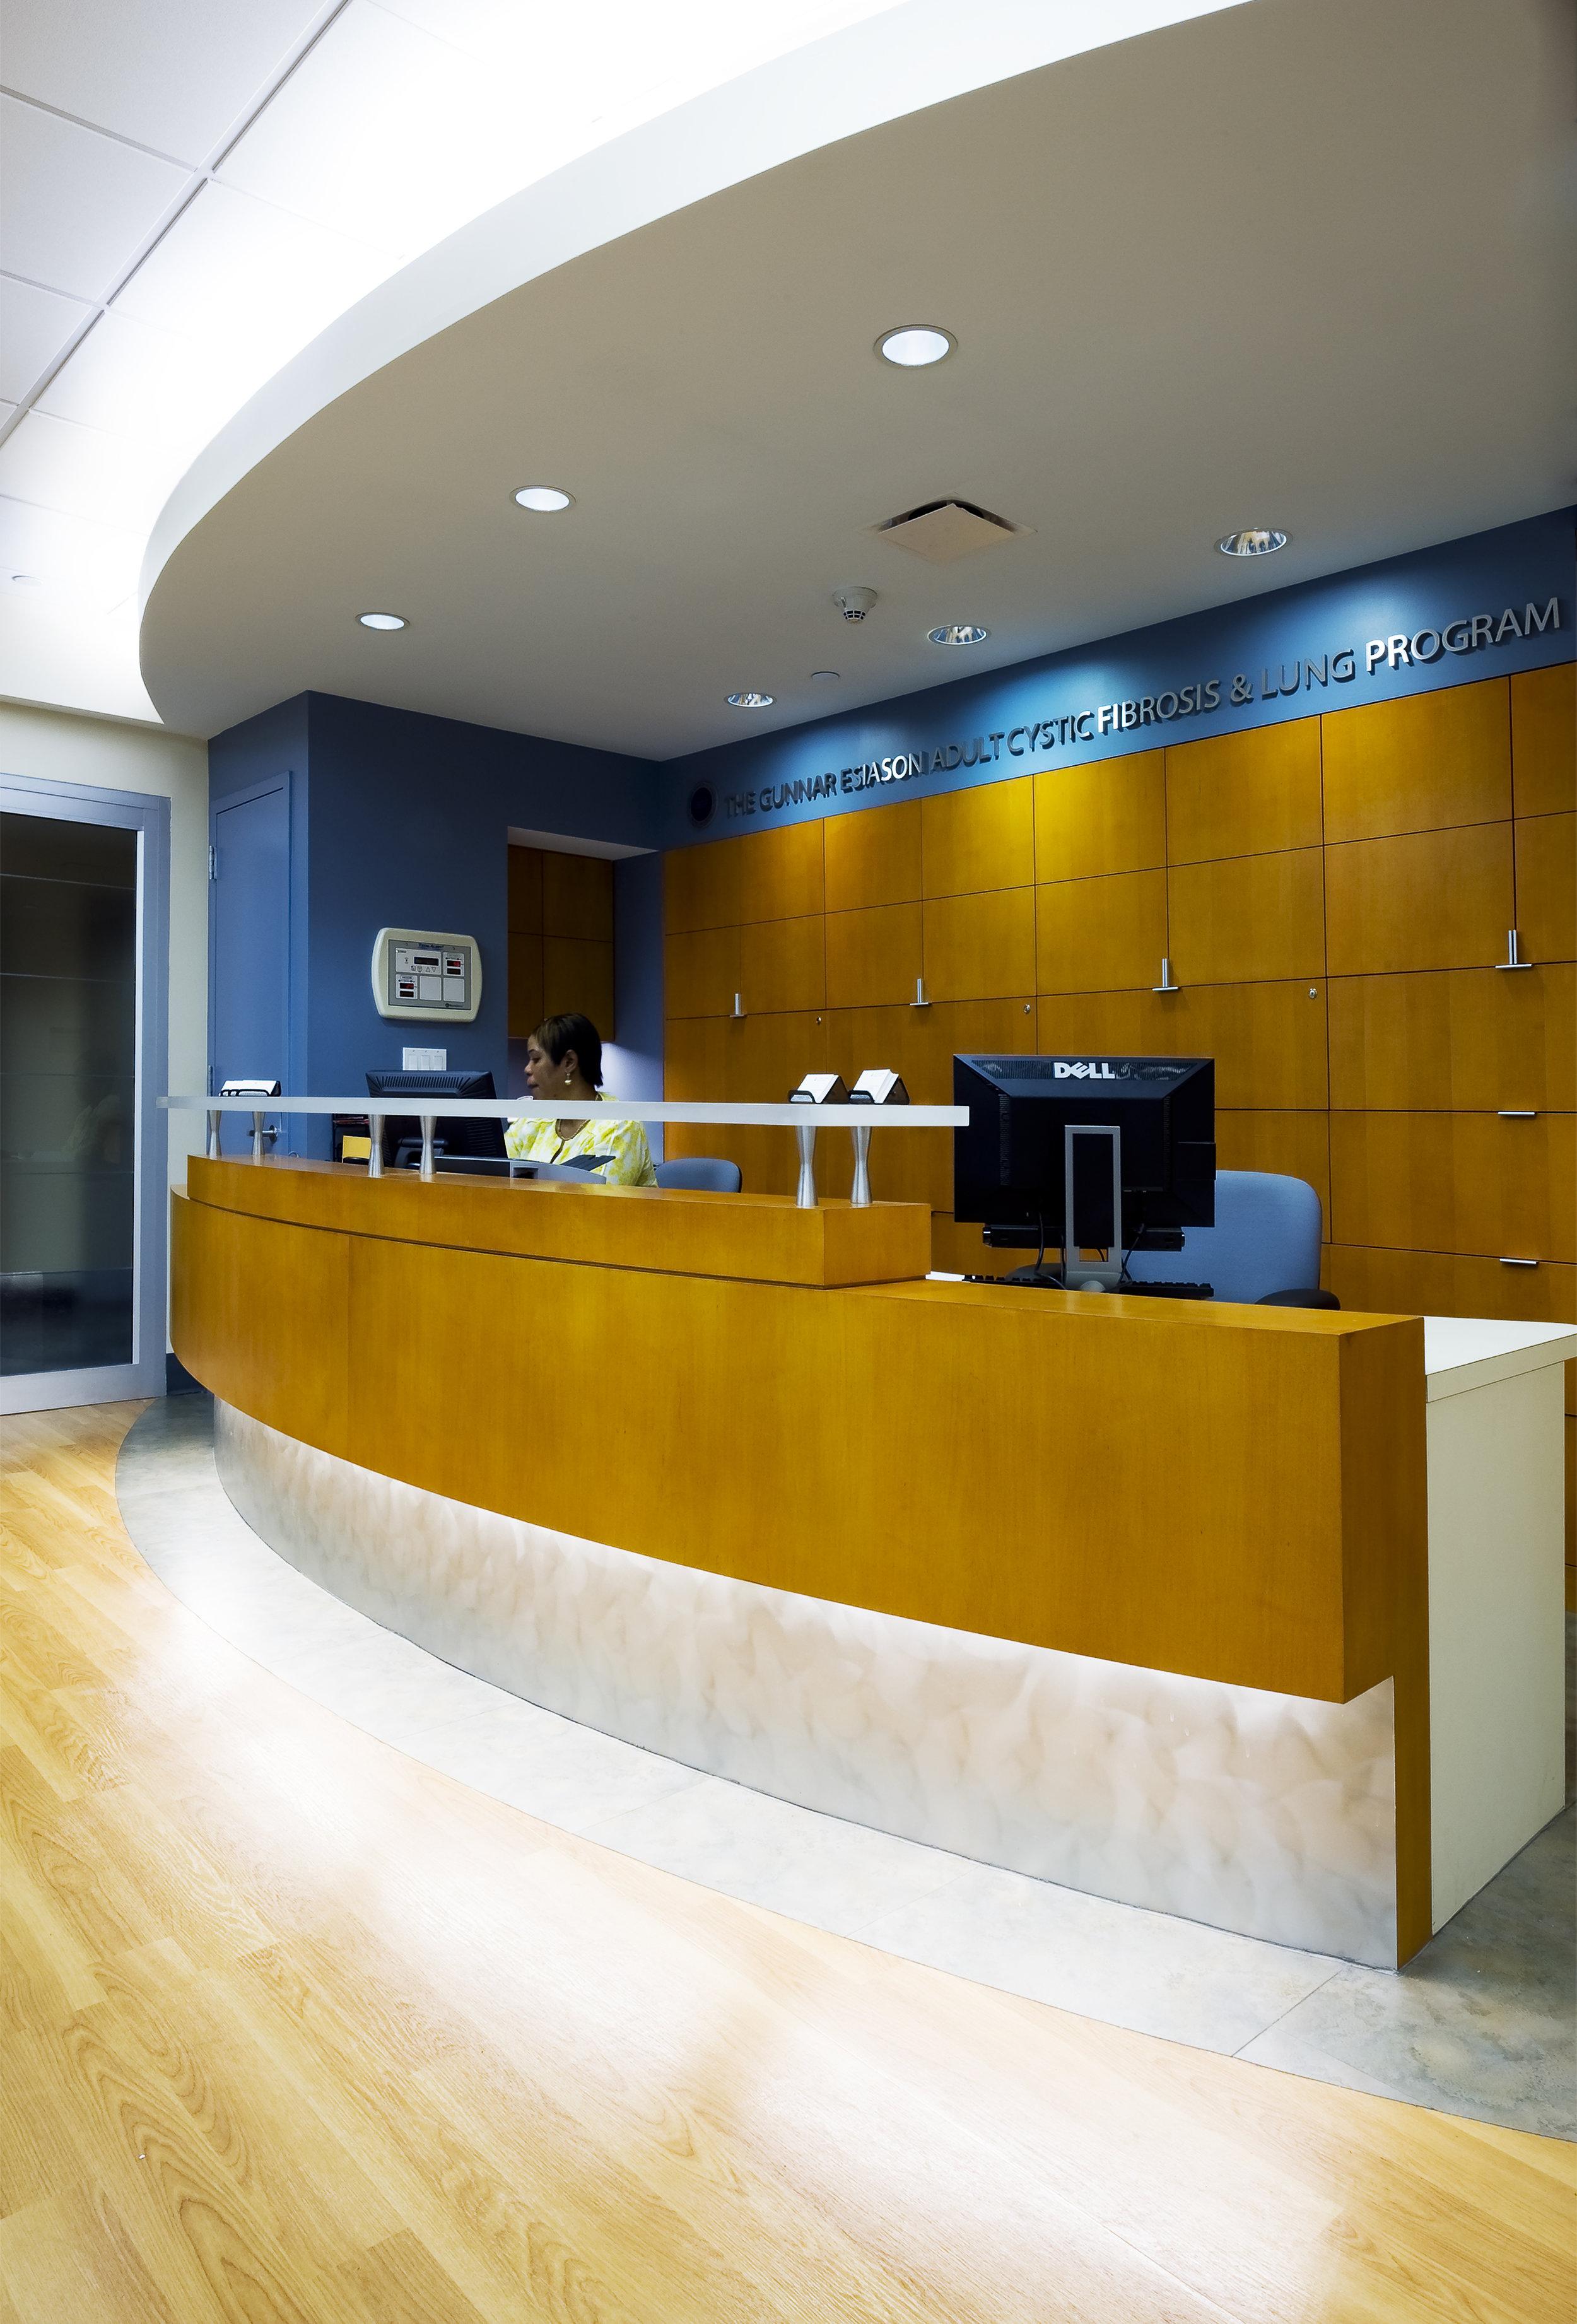 ESIASON CYSTIC FIBROSIS & LUNG CENTER - COLUMBIA UNIVERSITY MEDICAL CENTER